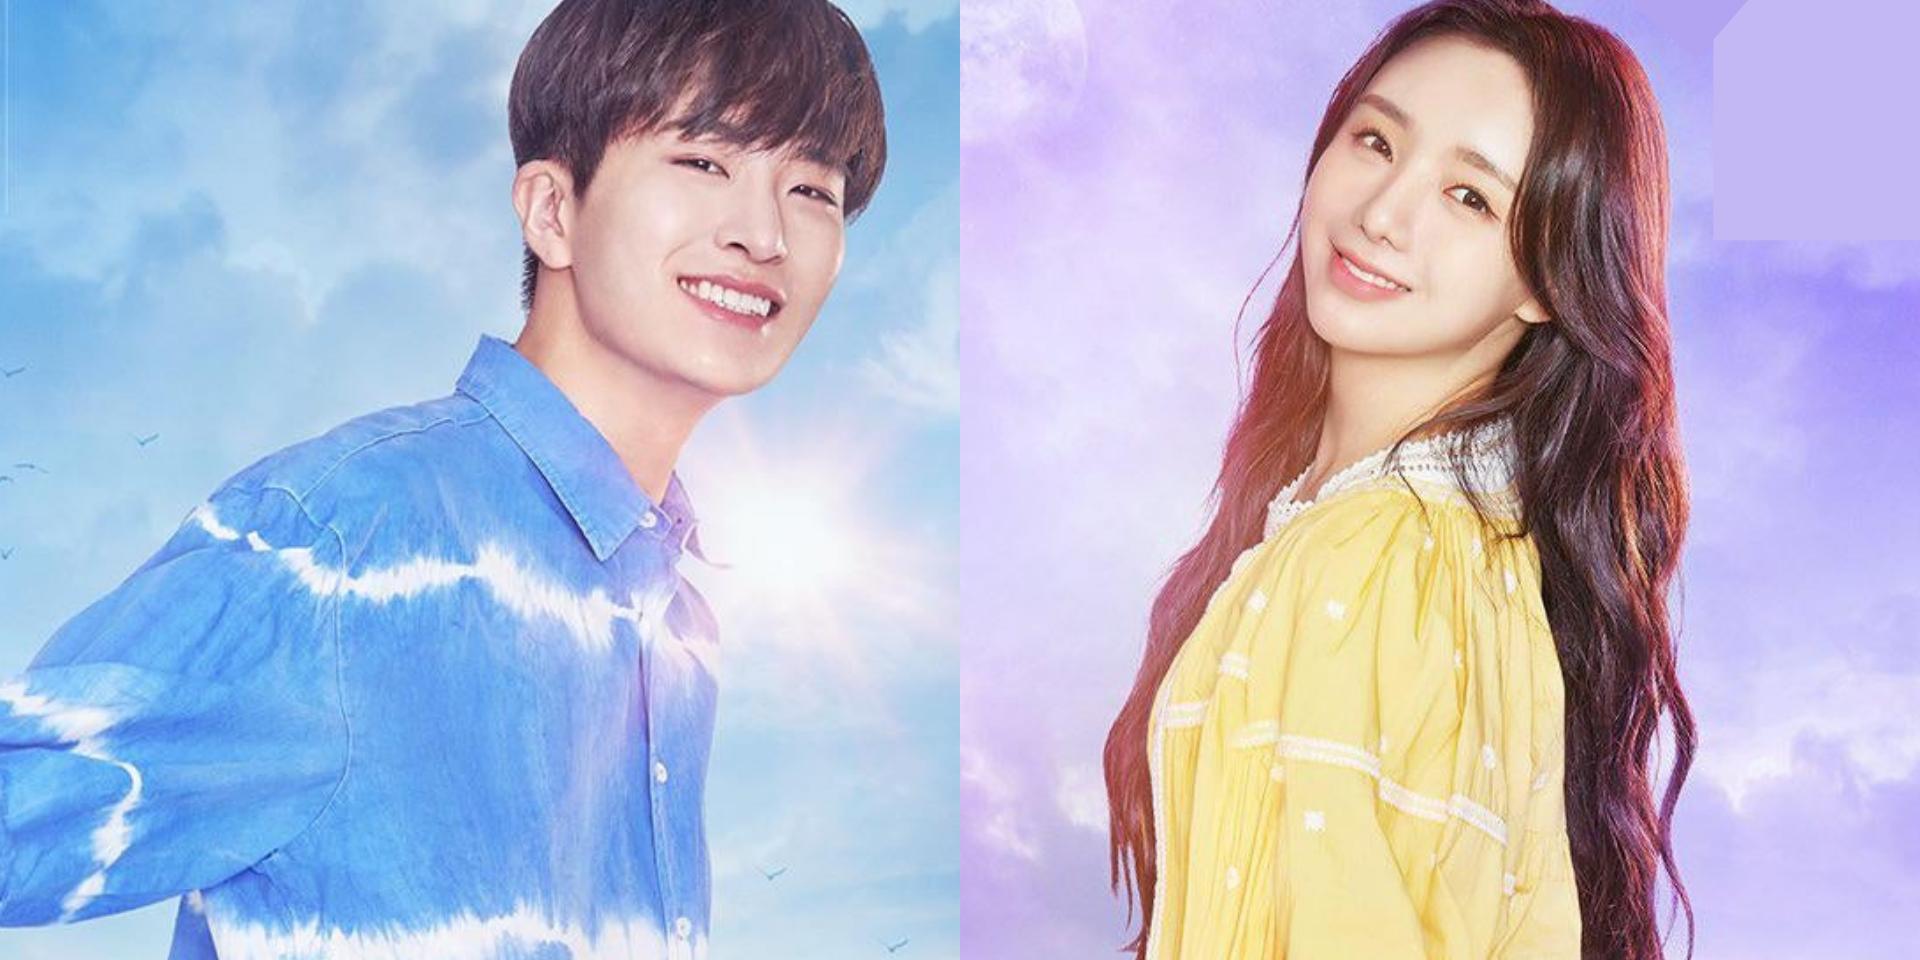 دانلود آهنگ جدید Good-Bye Days (Midnight Sun OST Part. 3) به نام Youngjae (GOT7) & Kei (Lovelyz)